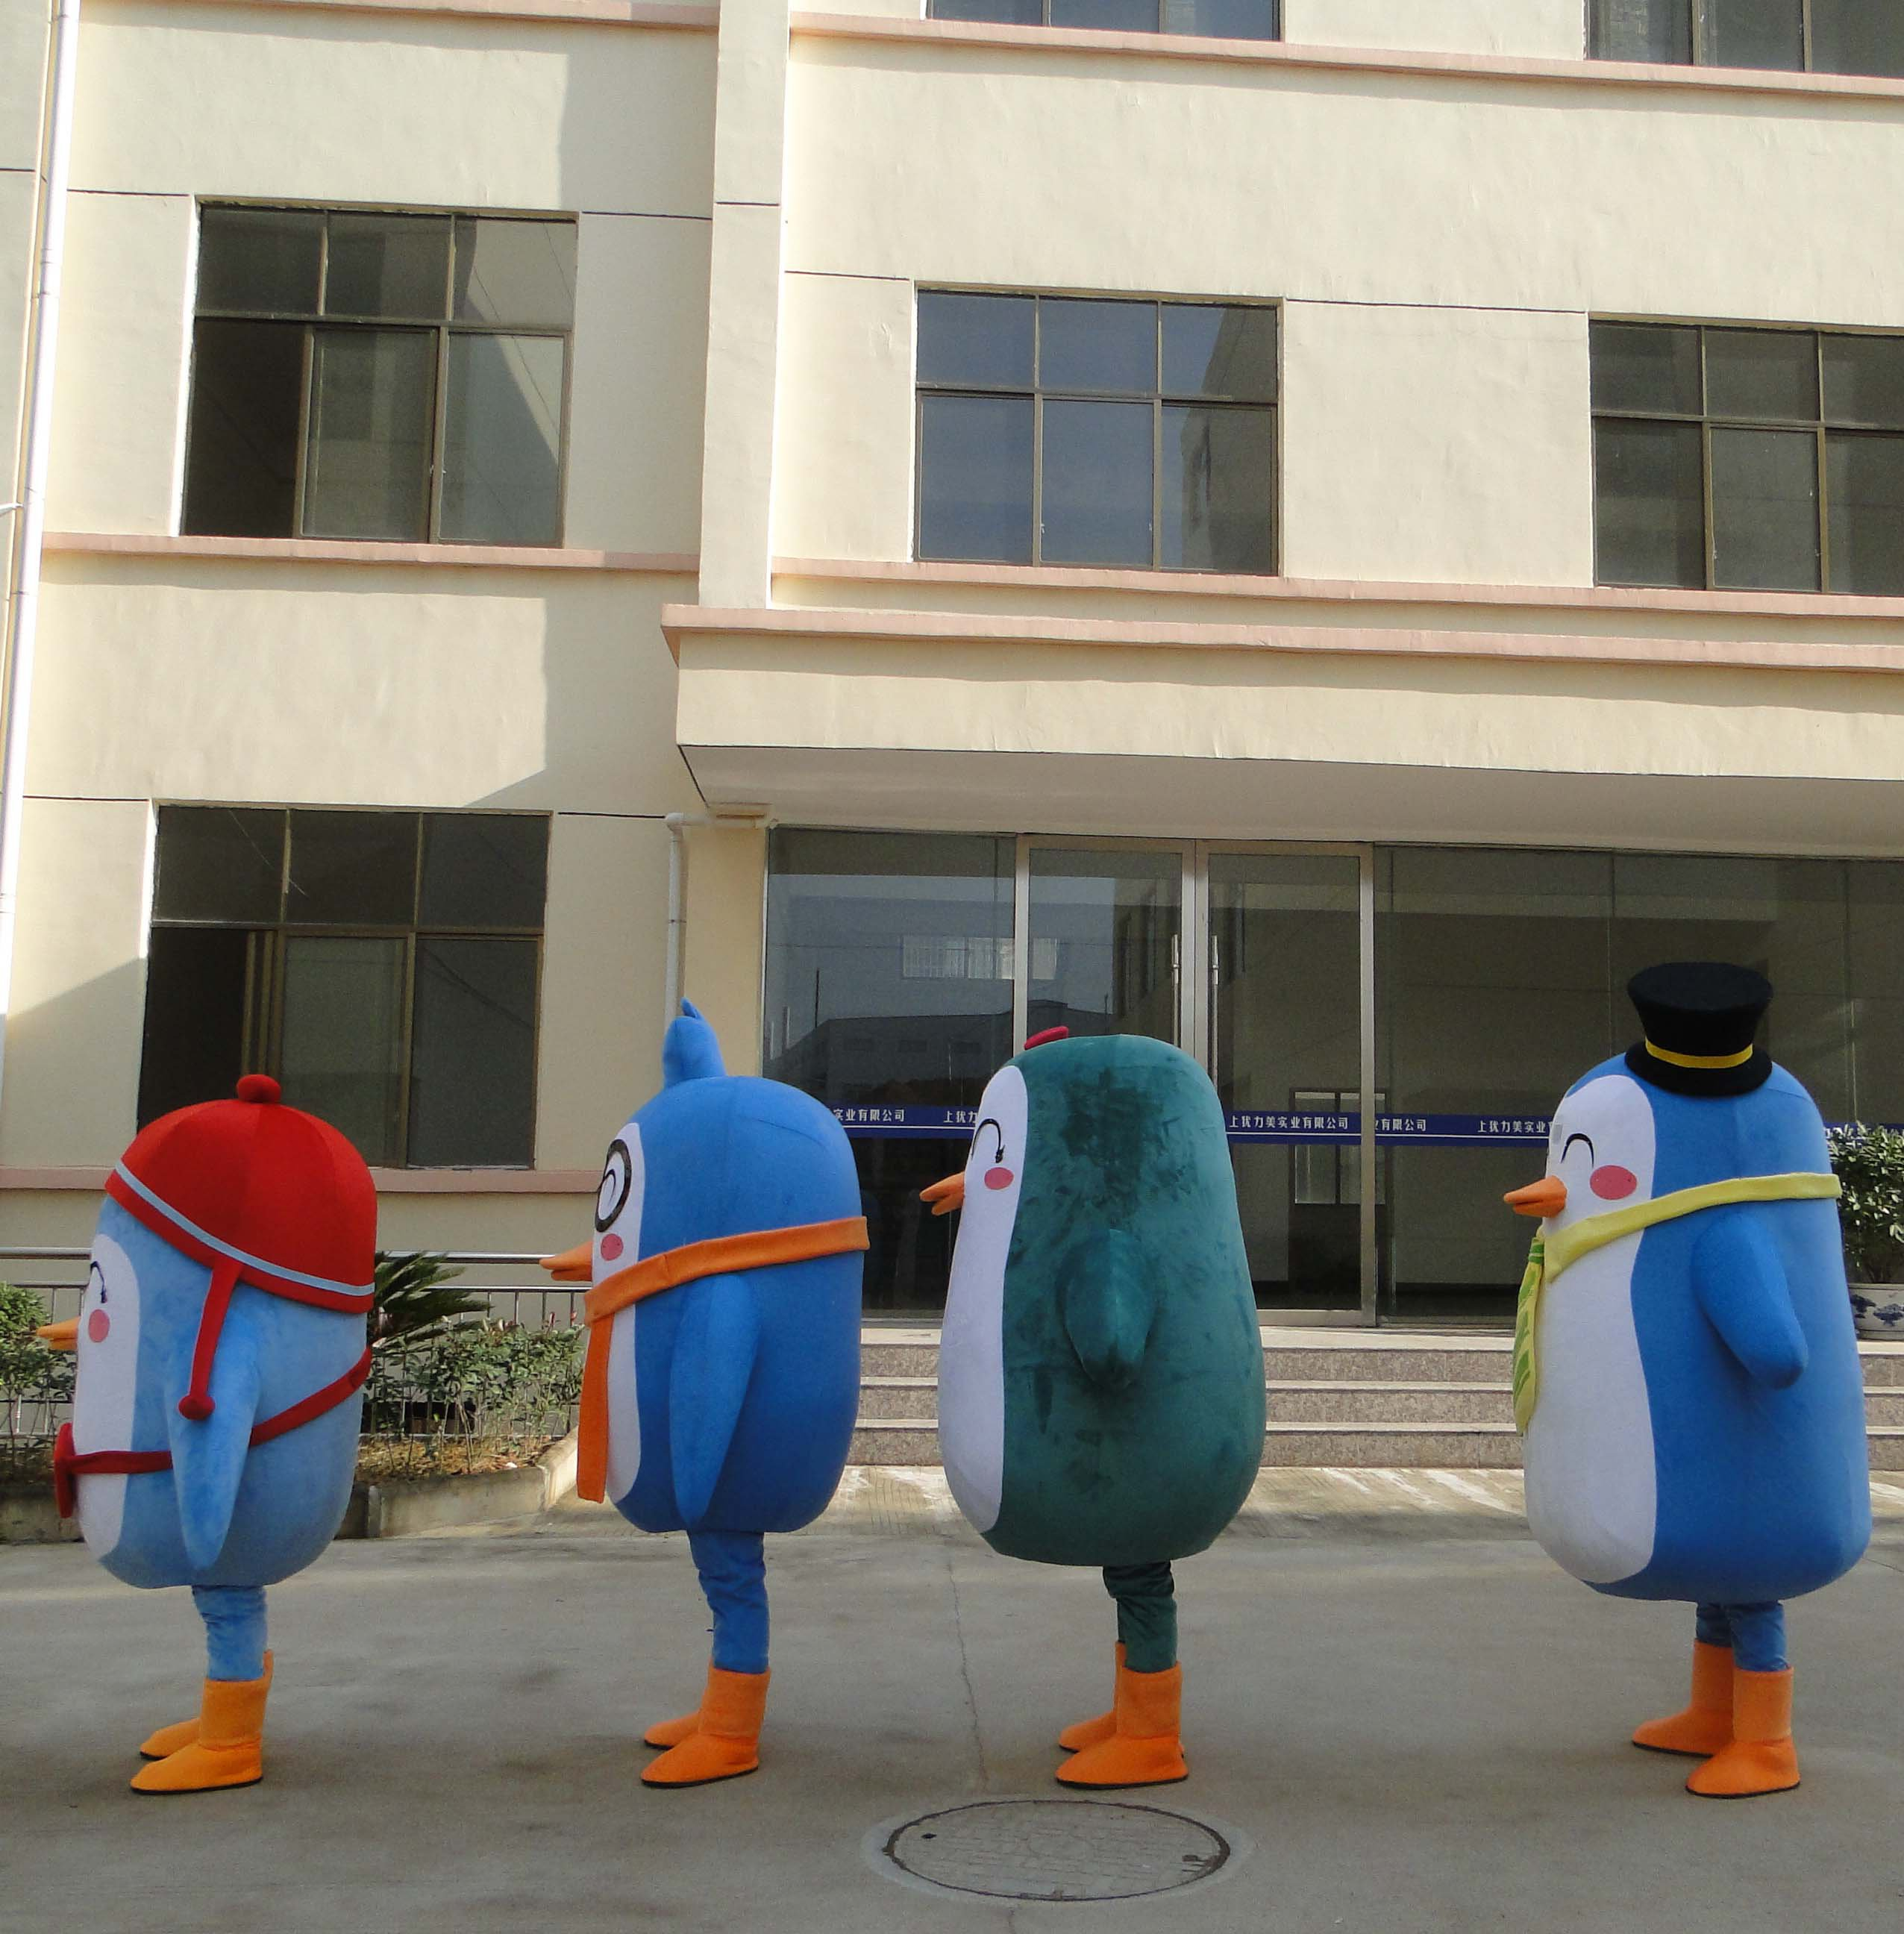 Penguin Cartoon Dolls Doll Clothing Large Doll Doll Cartoon Mascot Performance Props Mascot Costume